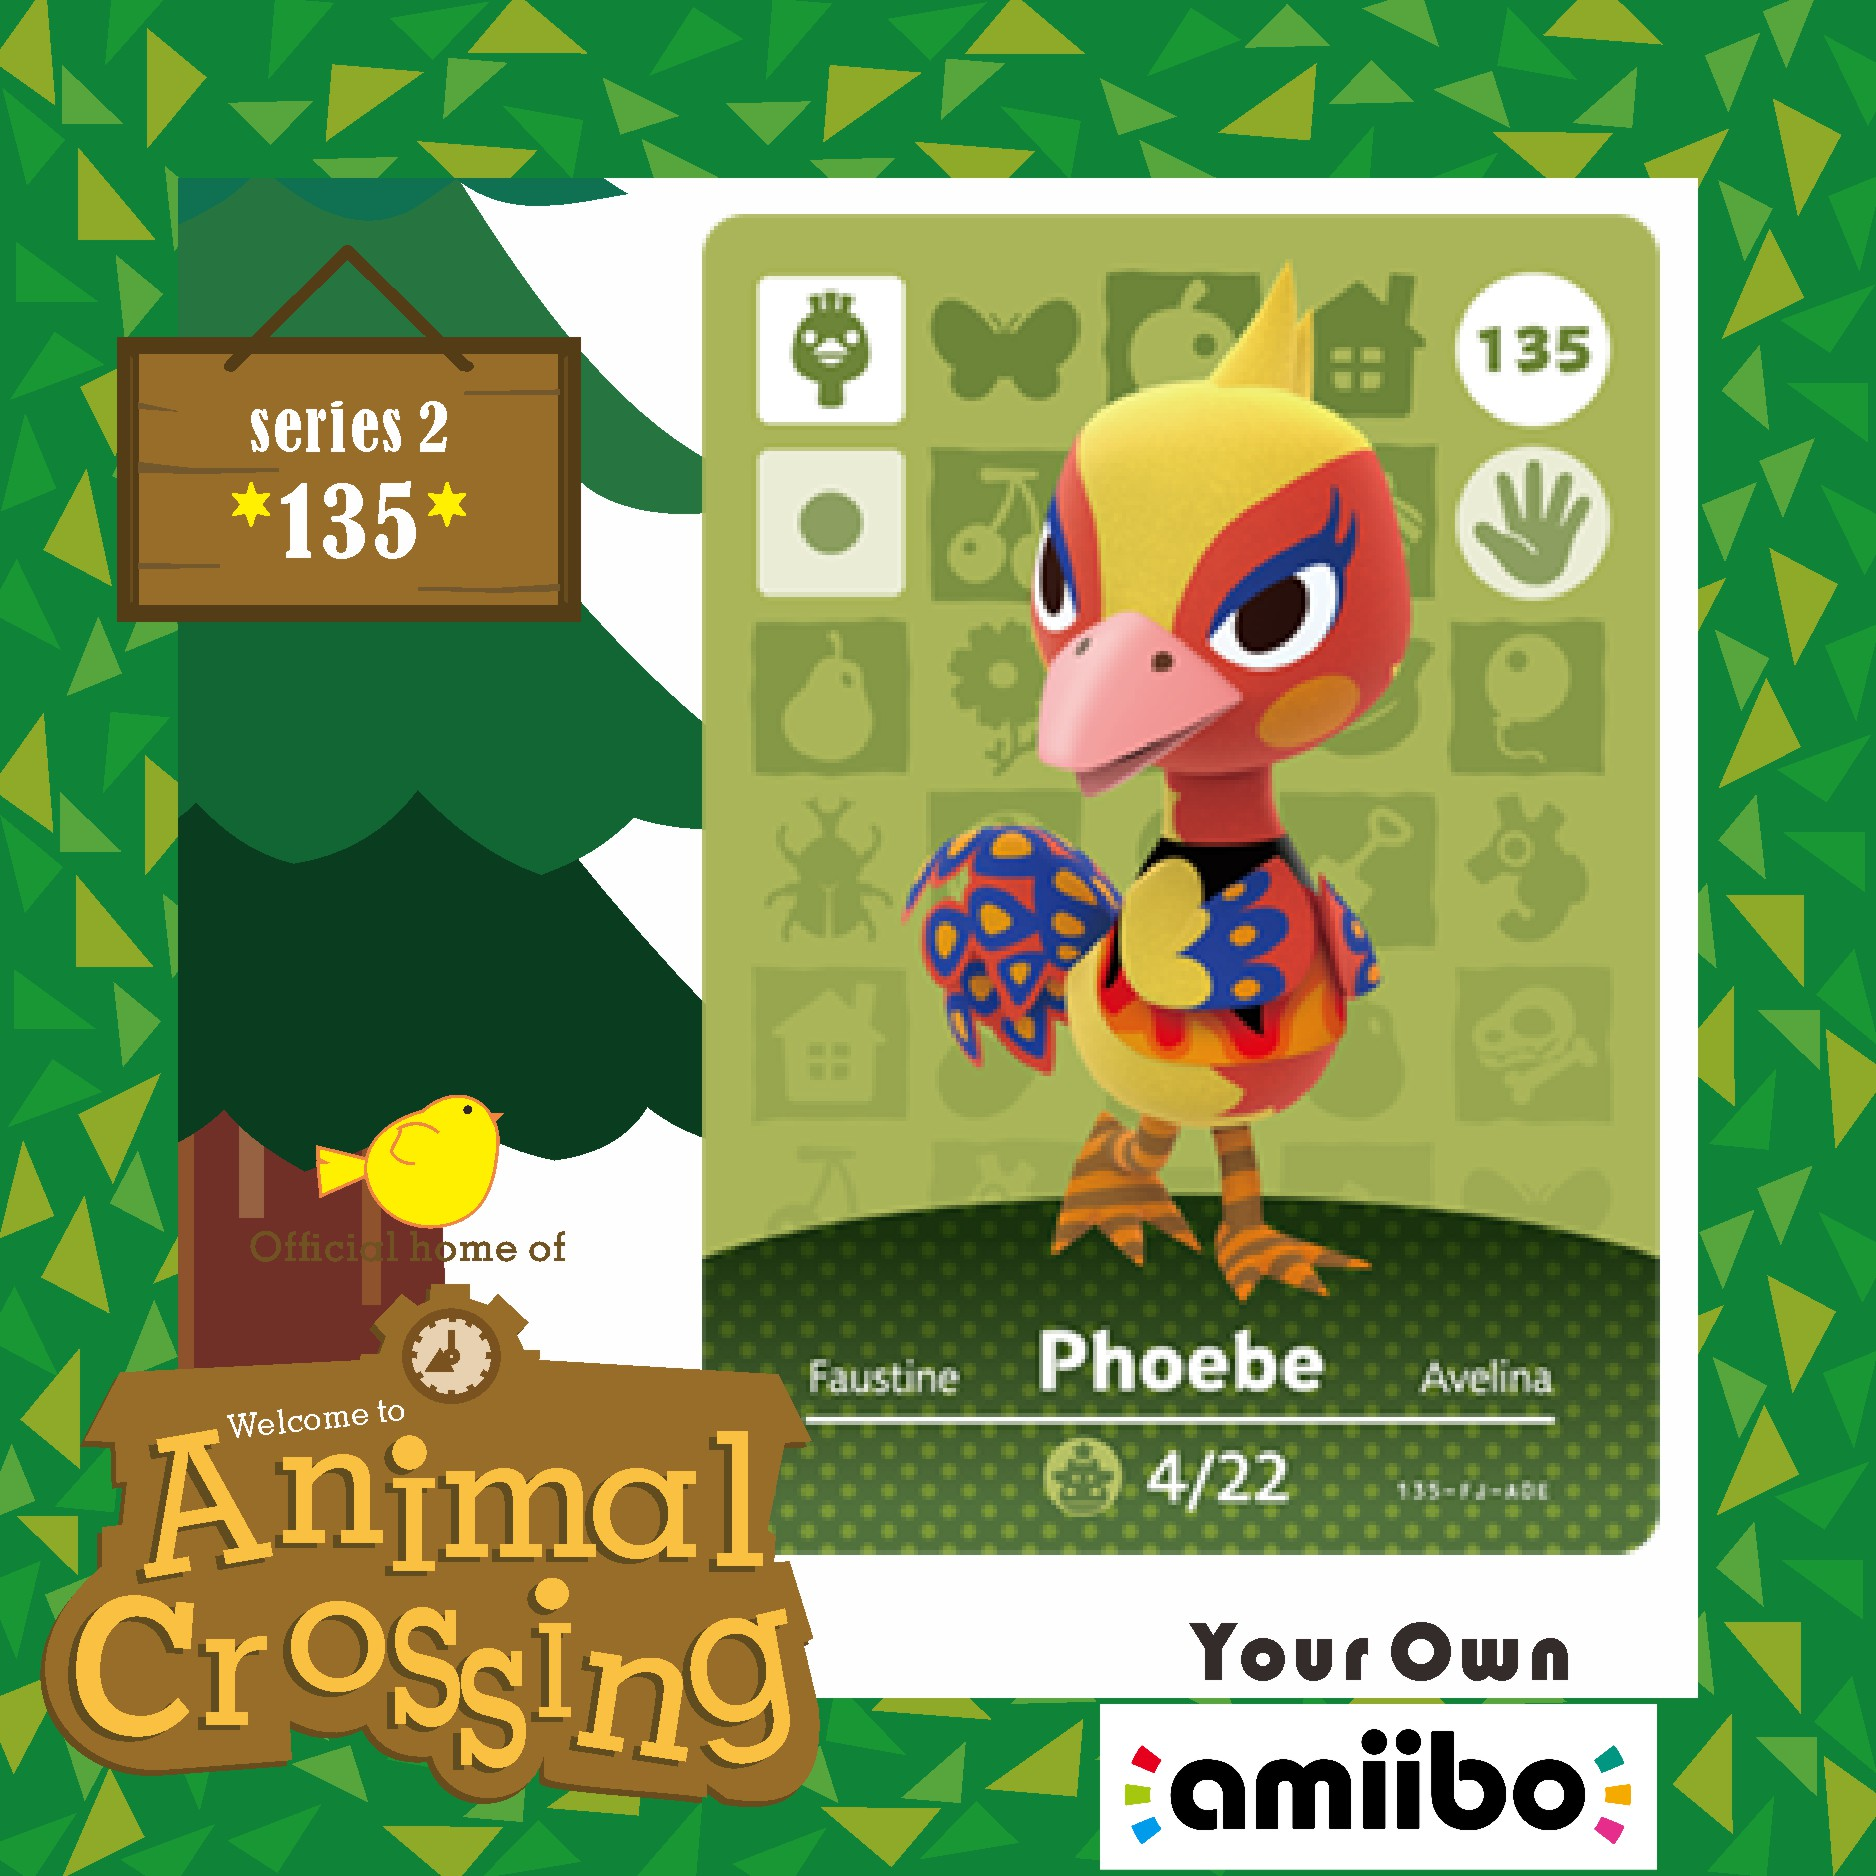 Animal Crossing Villager Amiibo Card 135 Amiibo Phoebe Animal Crossing New Horizons Villager card Phoebe 135  Series Set Season2 1